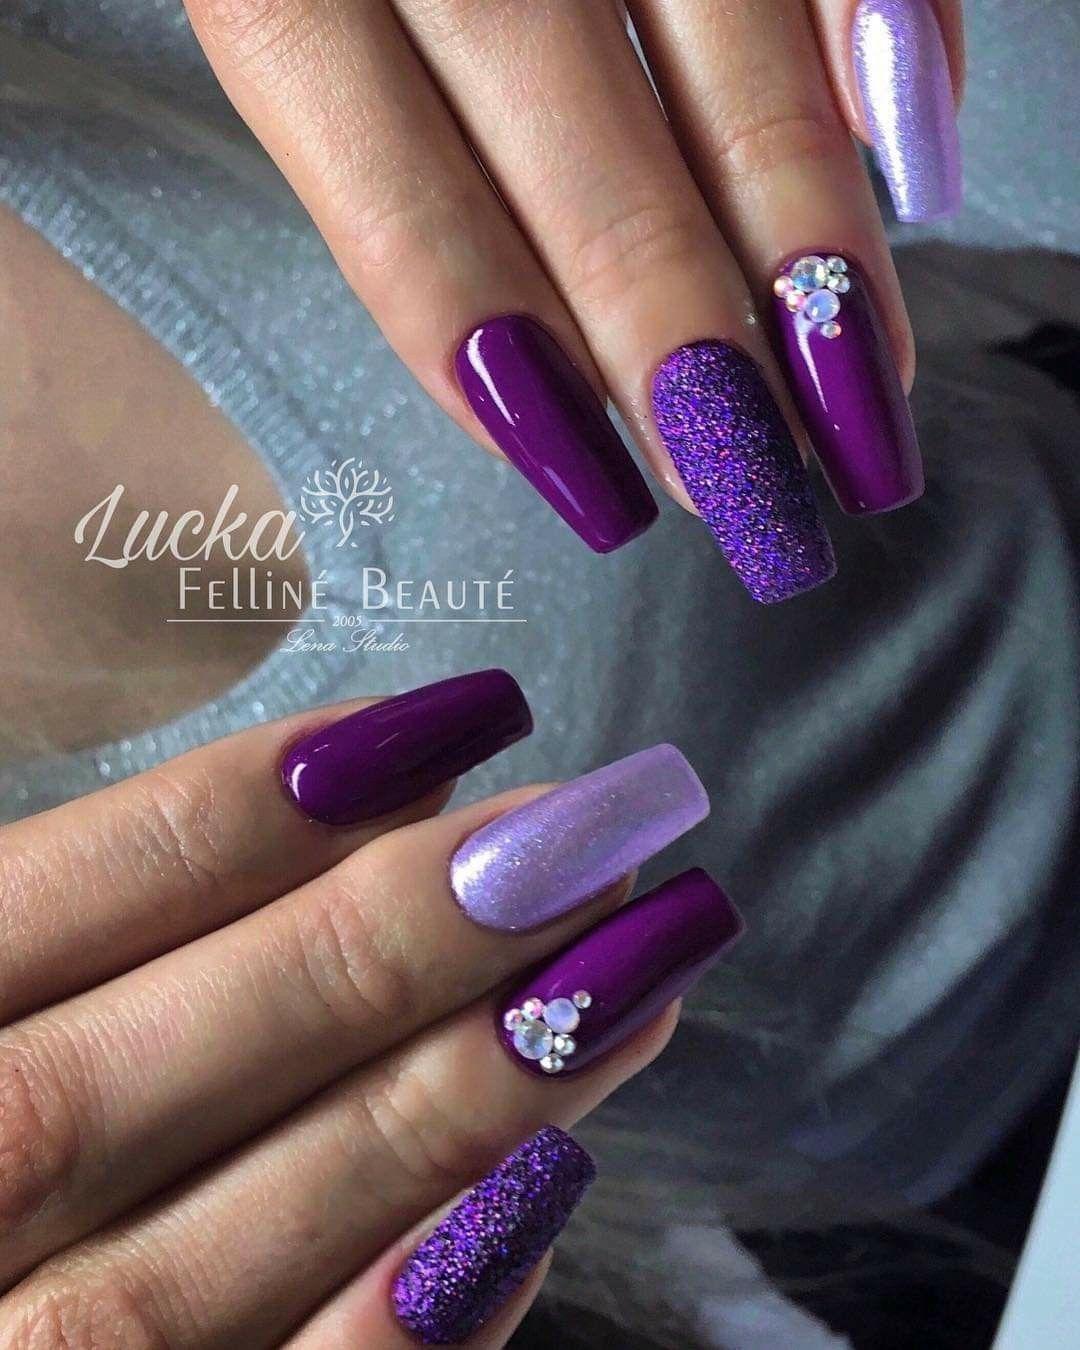 Trending Bridal Nail Art Design Ideas Best Bridal Nail Art Inspiration Easy Nail Art Ideas In 2020 Purple Nail Art Designs Purple Nail Designs Purple Acrylic Nails